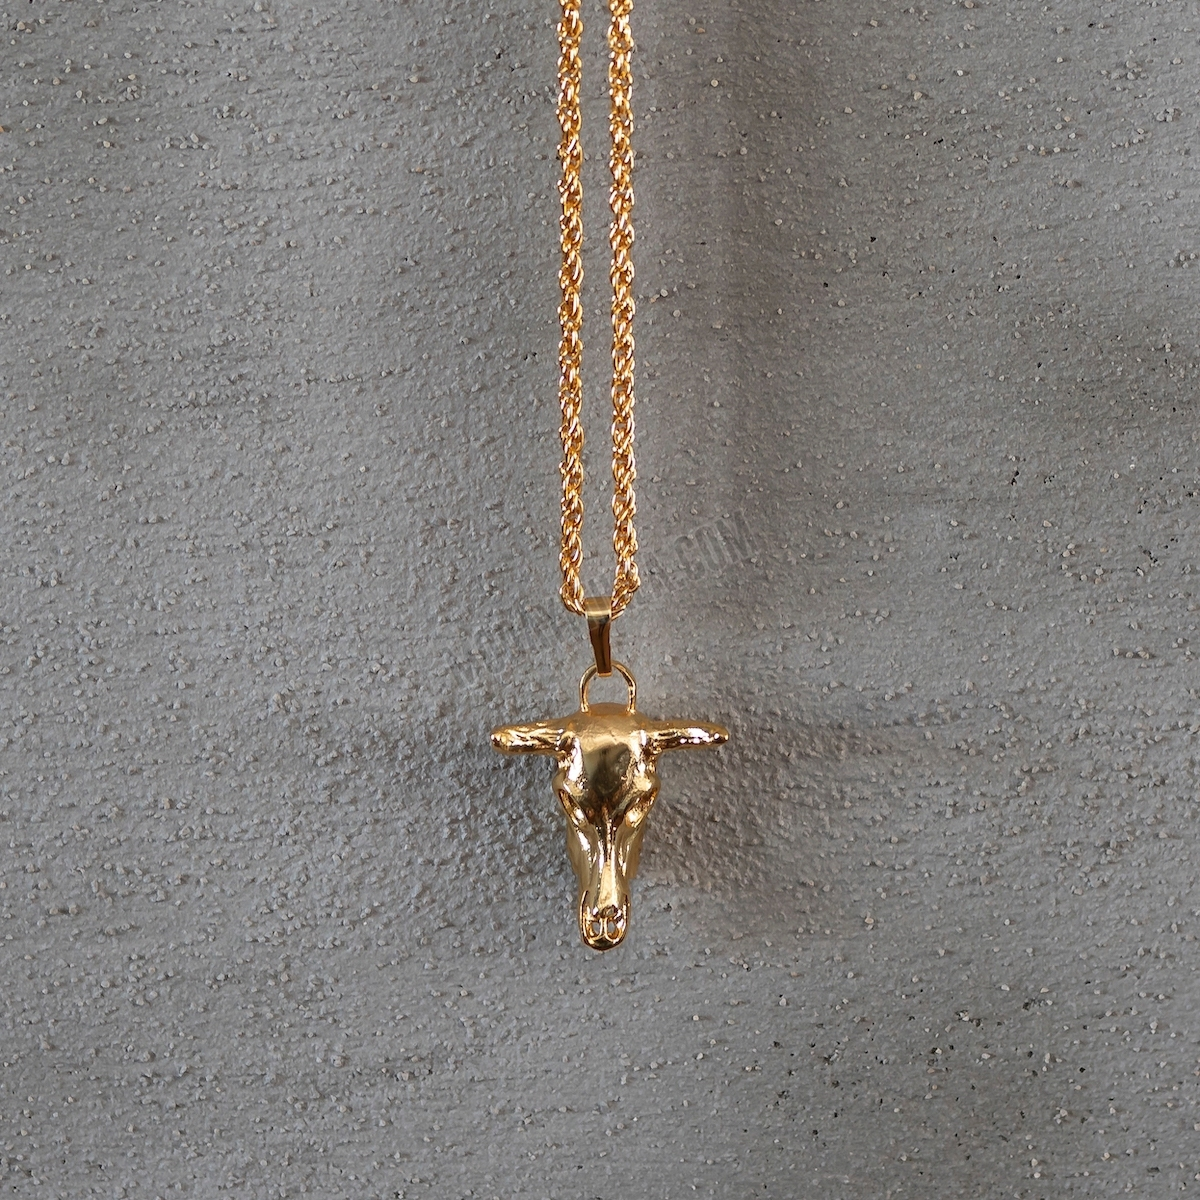 Gold Boğa Boynuzu Uzun Kolye